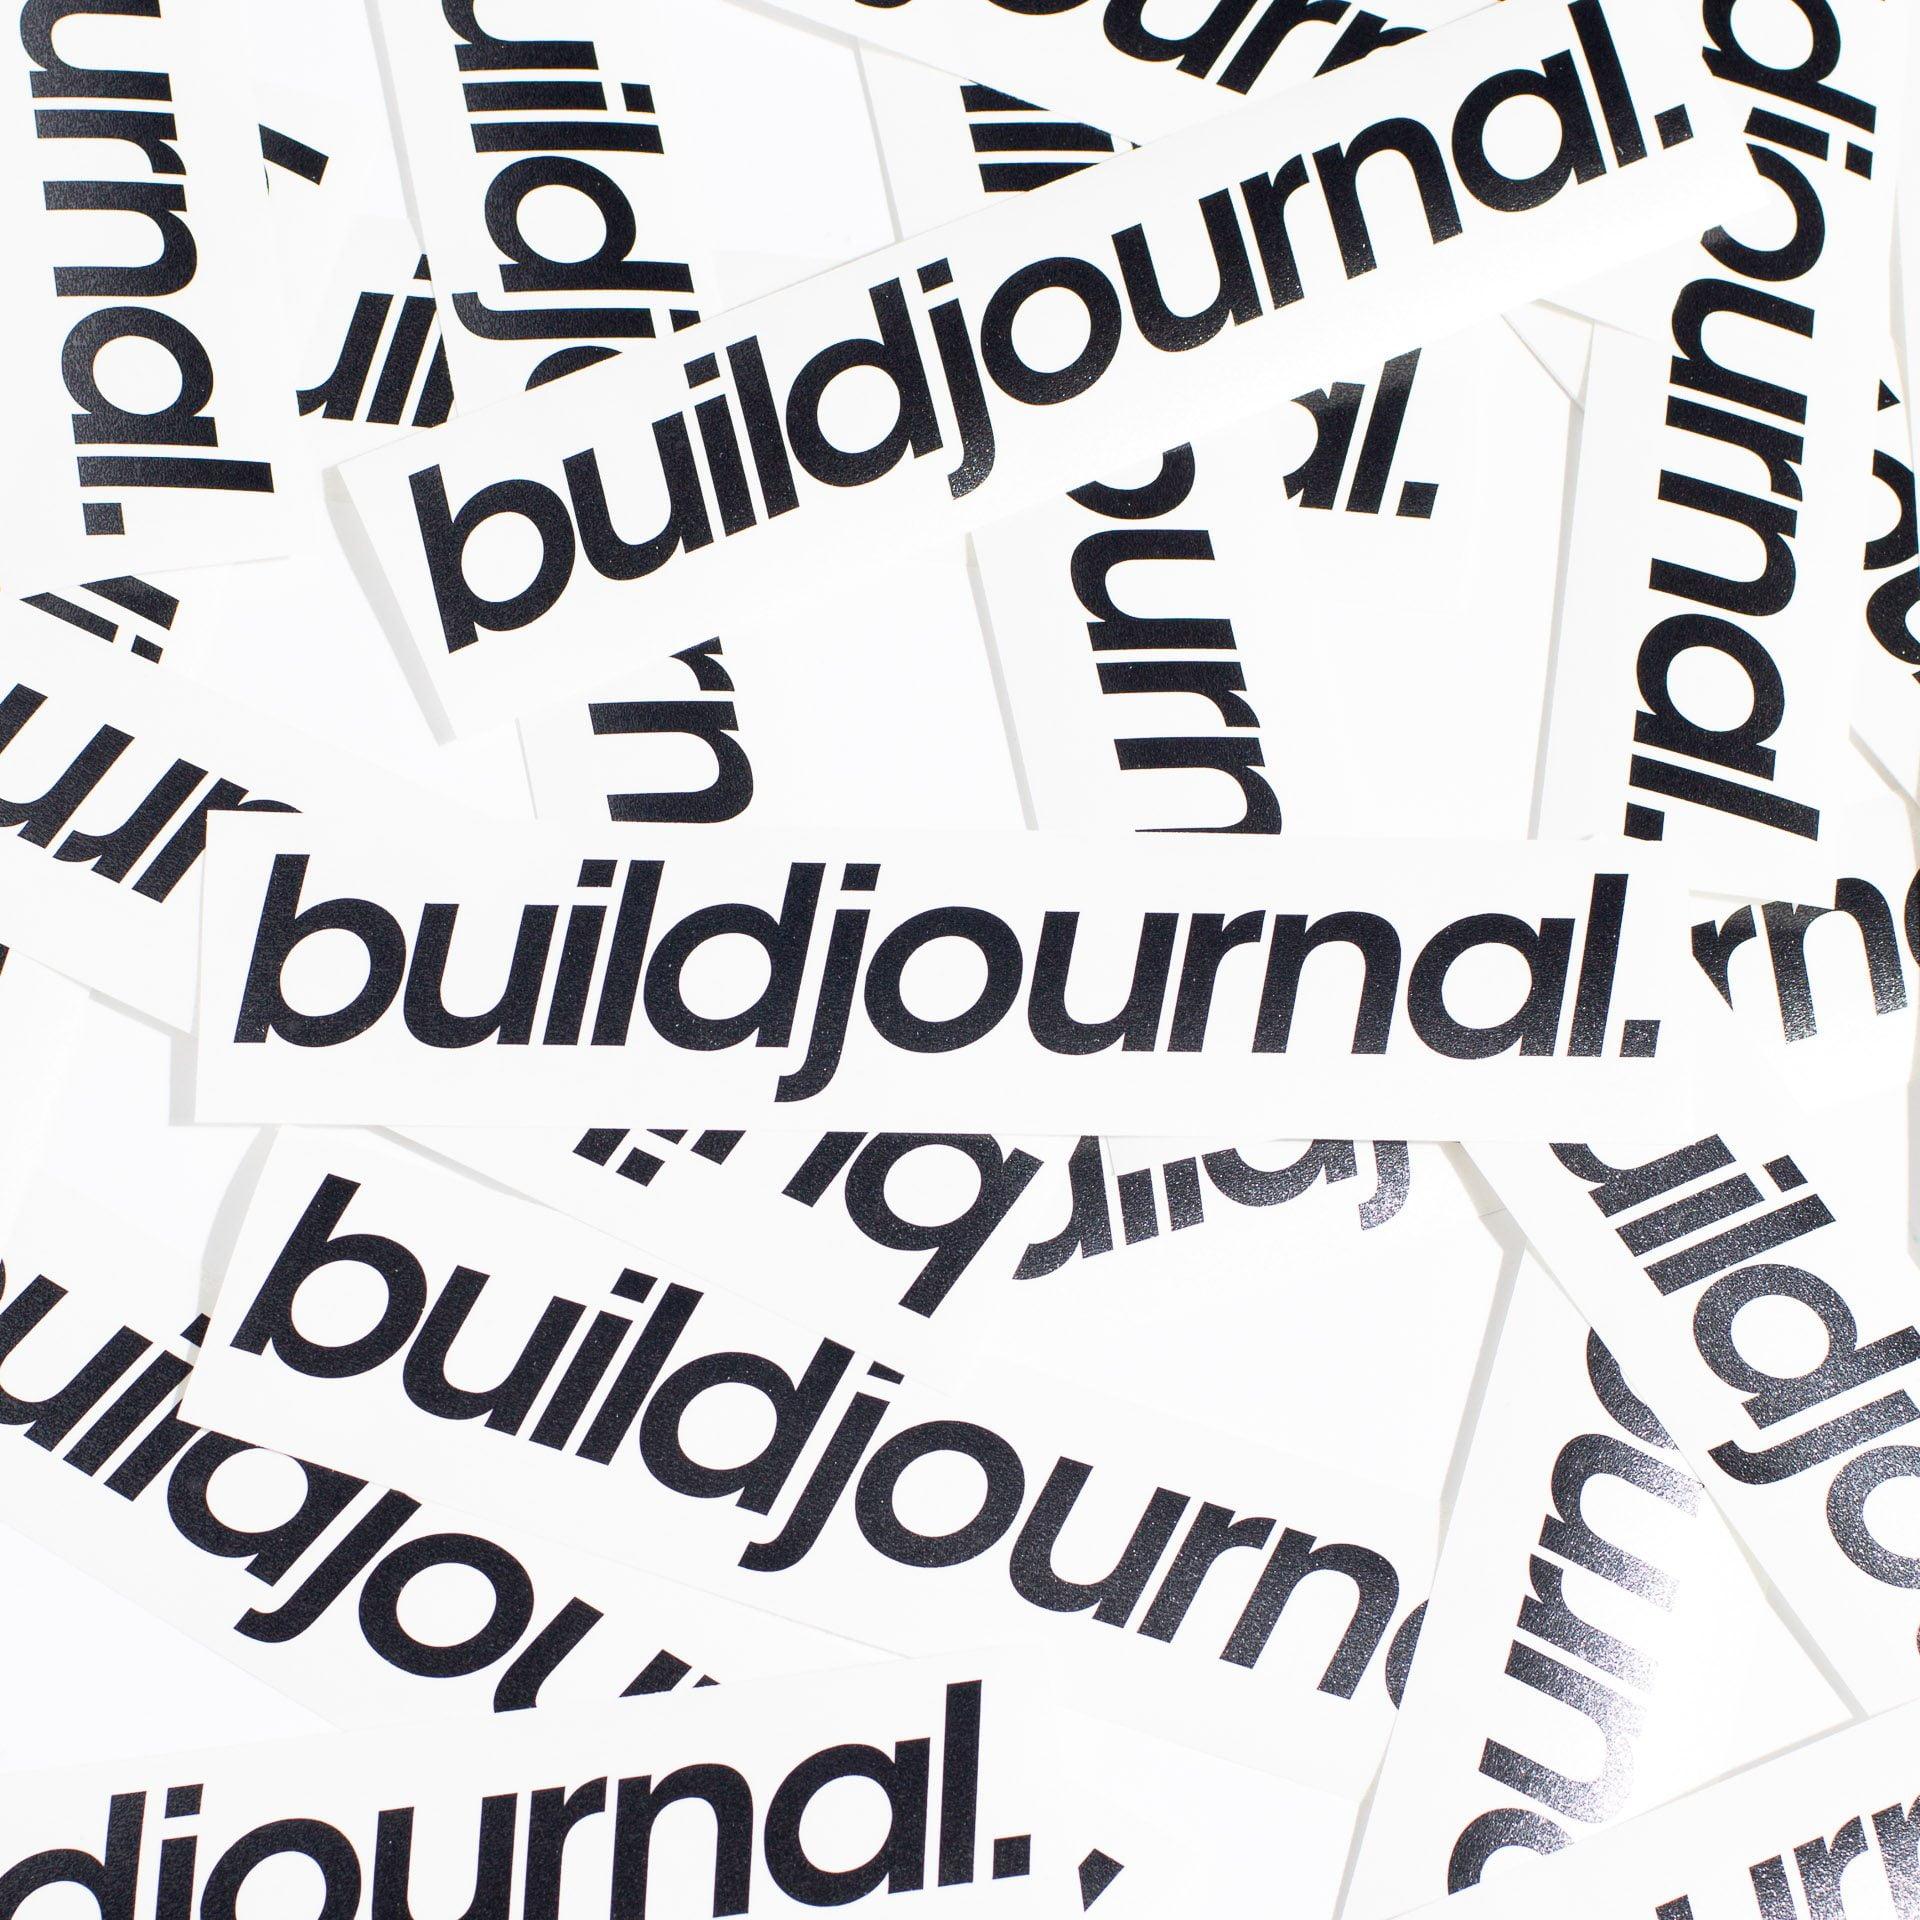 Buildjournal 8.5